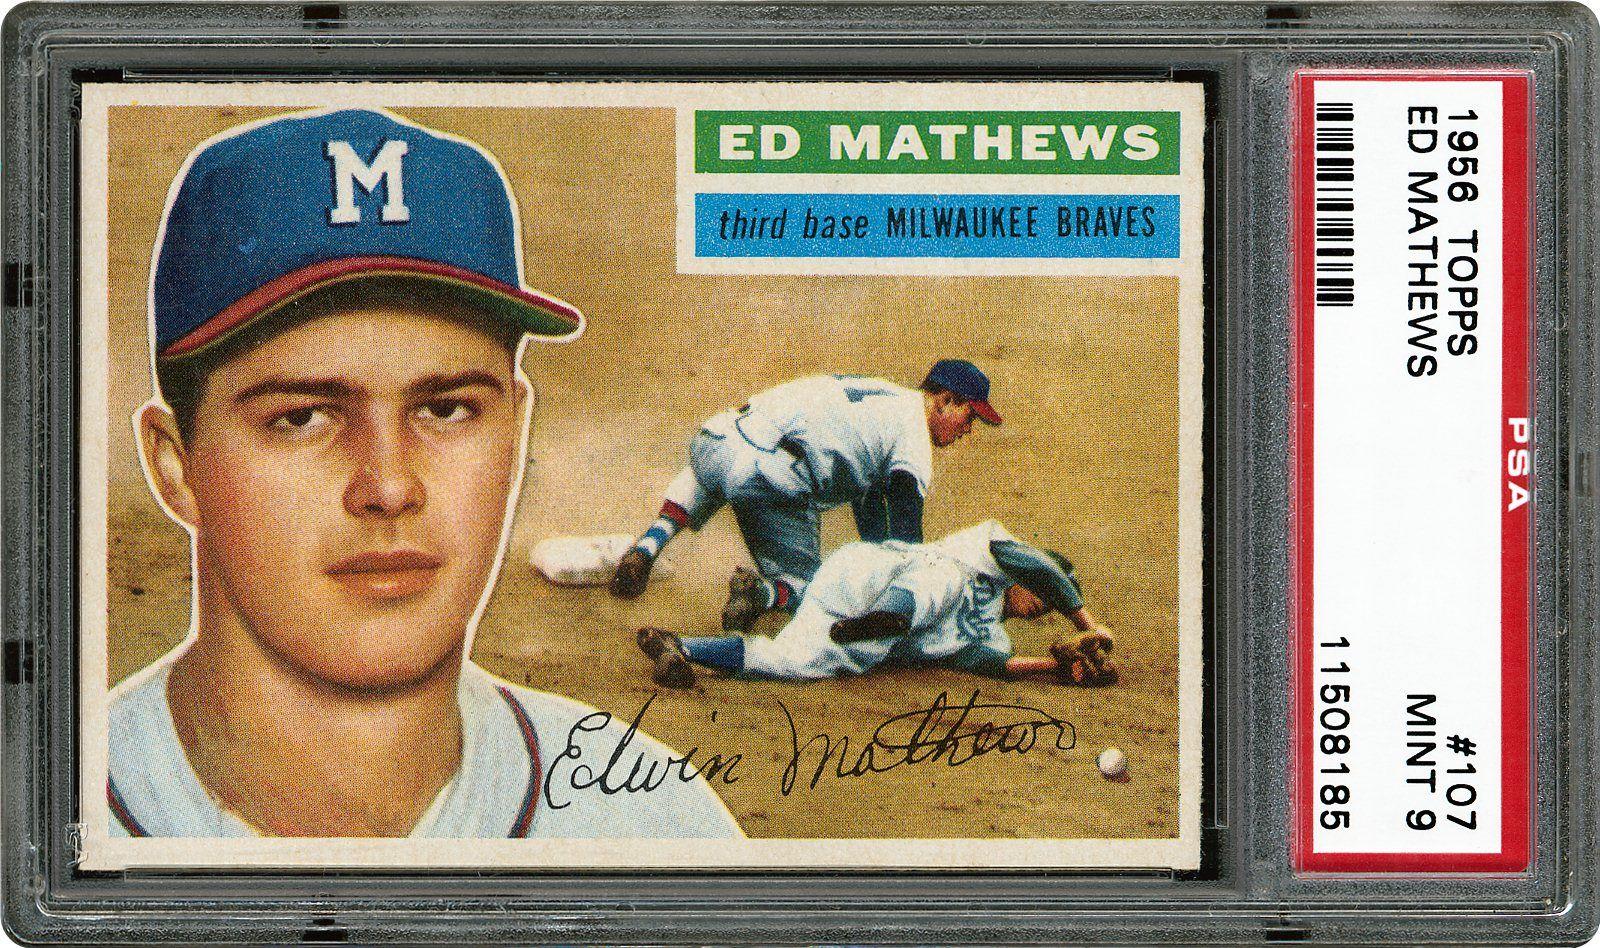 1956 Topps Ed Mathews Psa Cardfacts